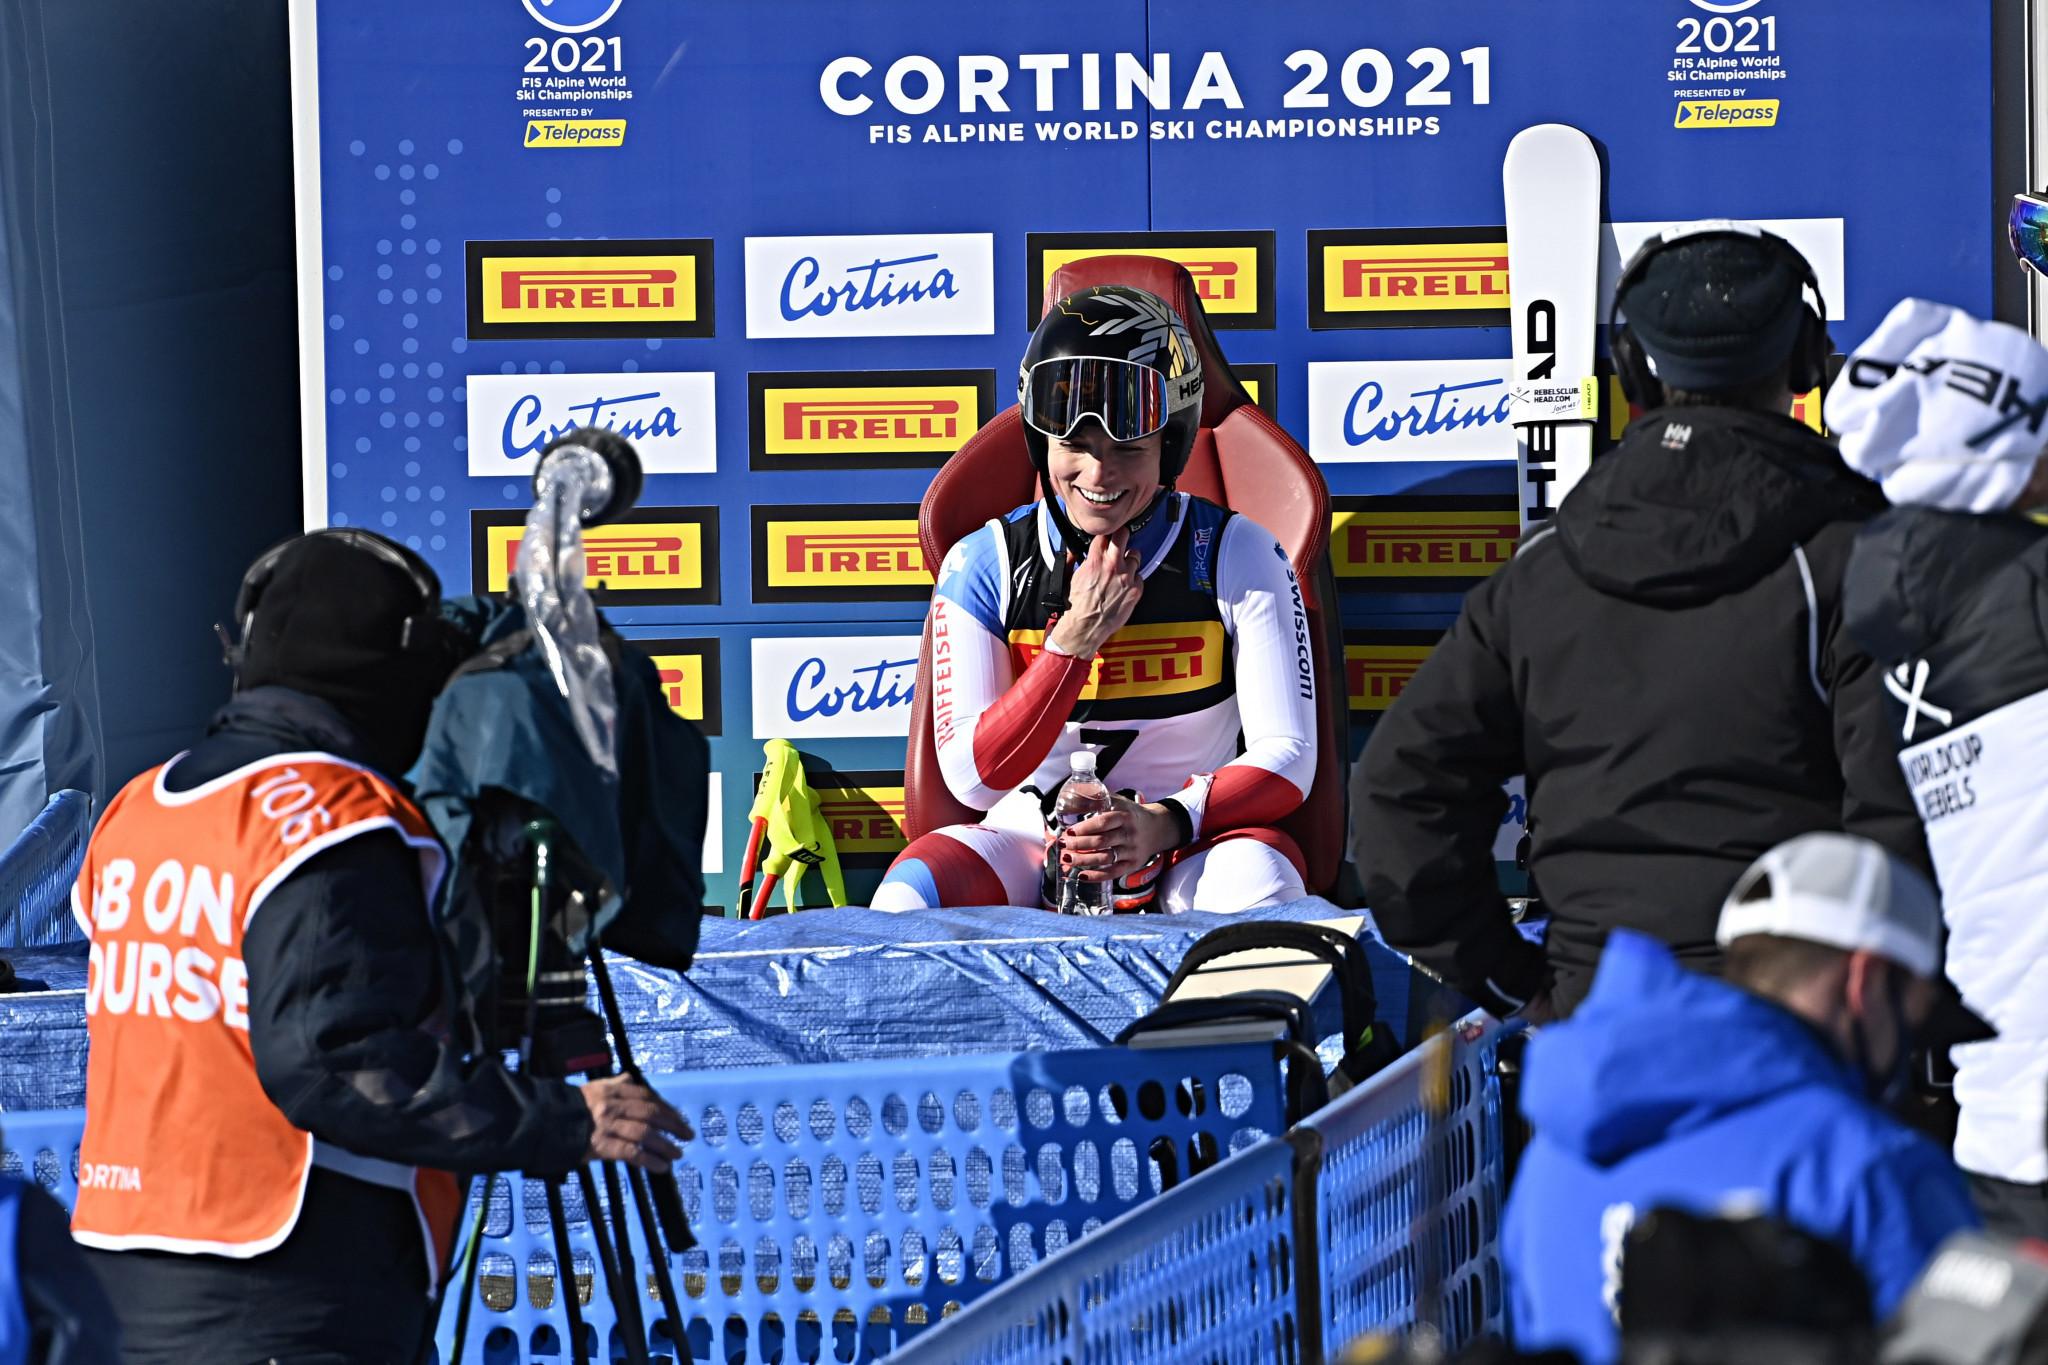 Lara Gut-Behrami celebrated her maiden world title ©Getty Images